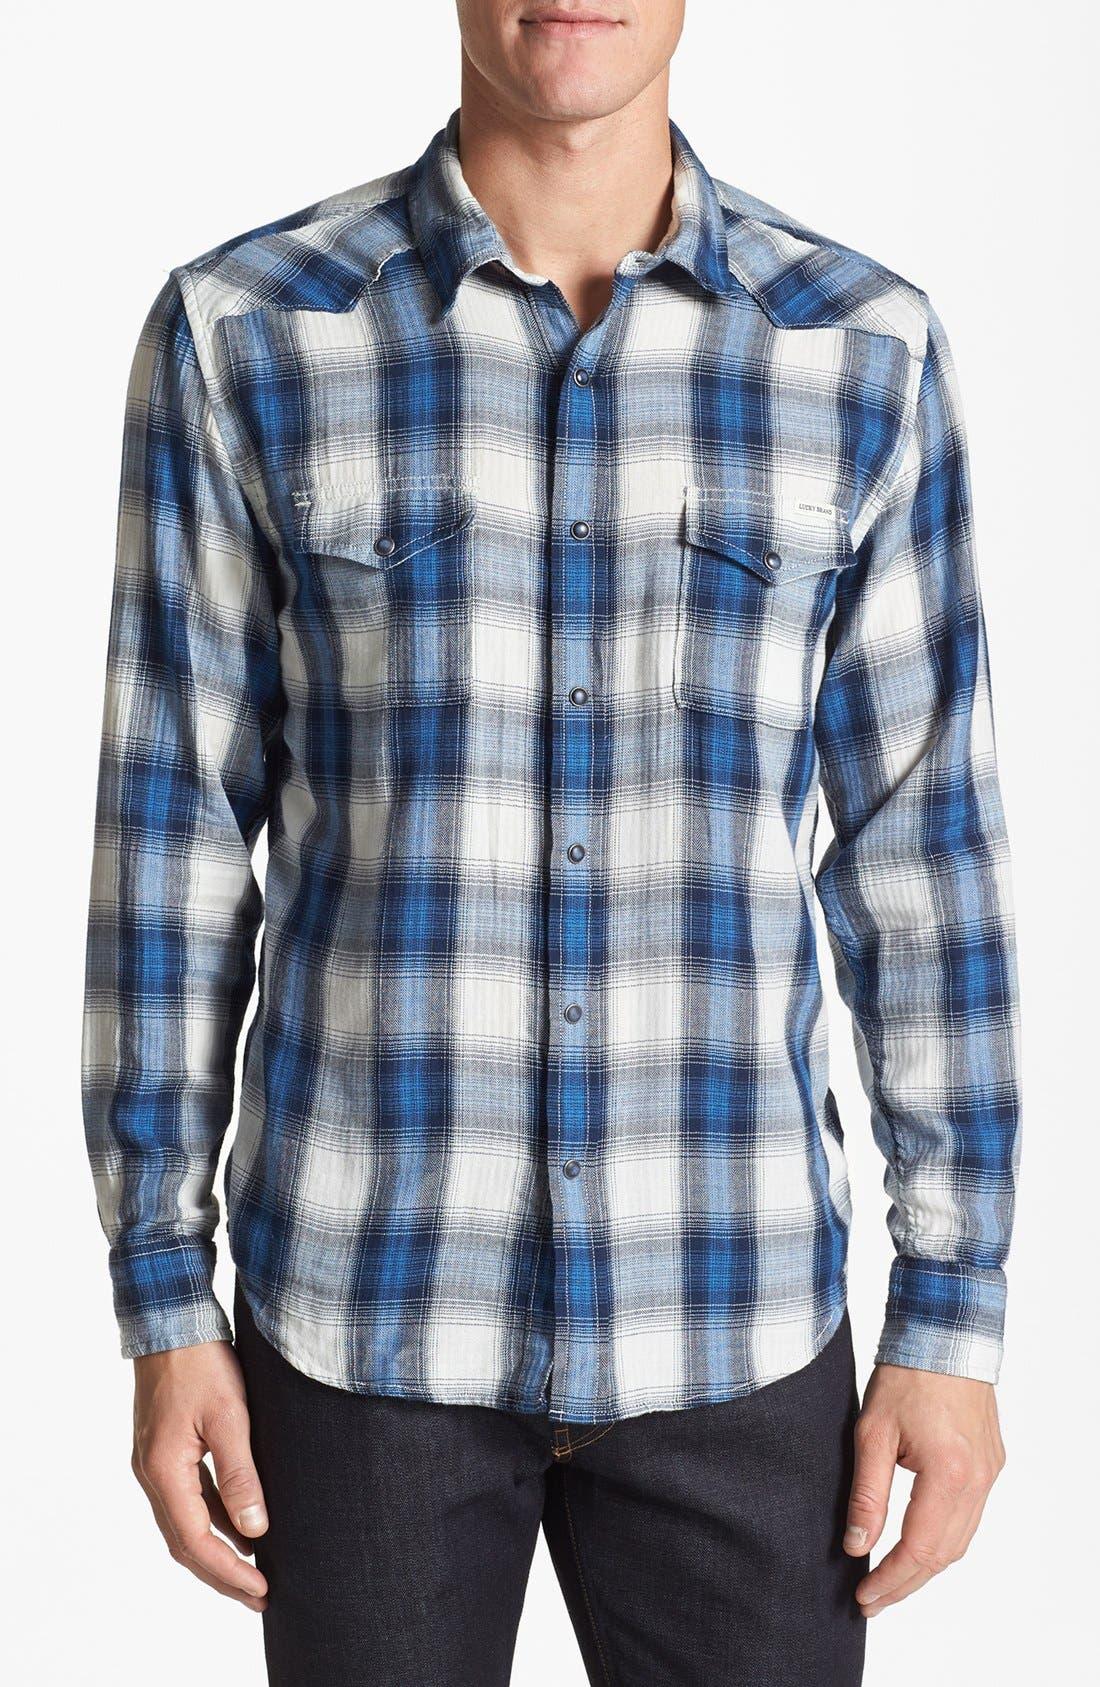 Main Image - Lucky Brand 'Spearhead' Plaid Western Shirt